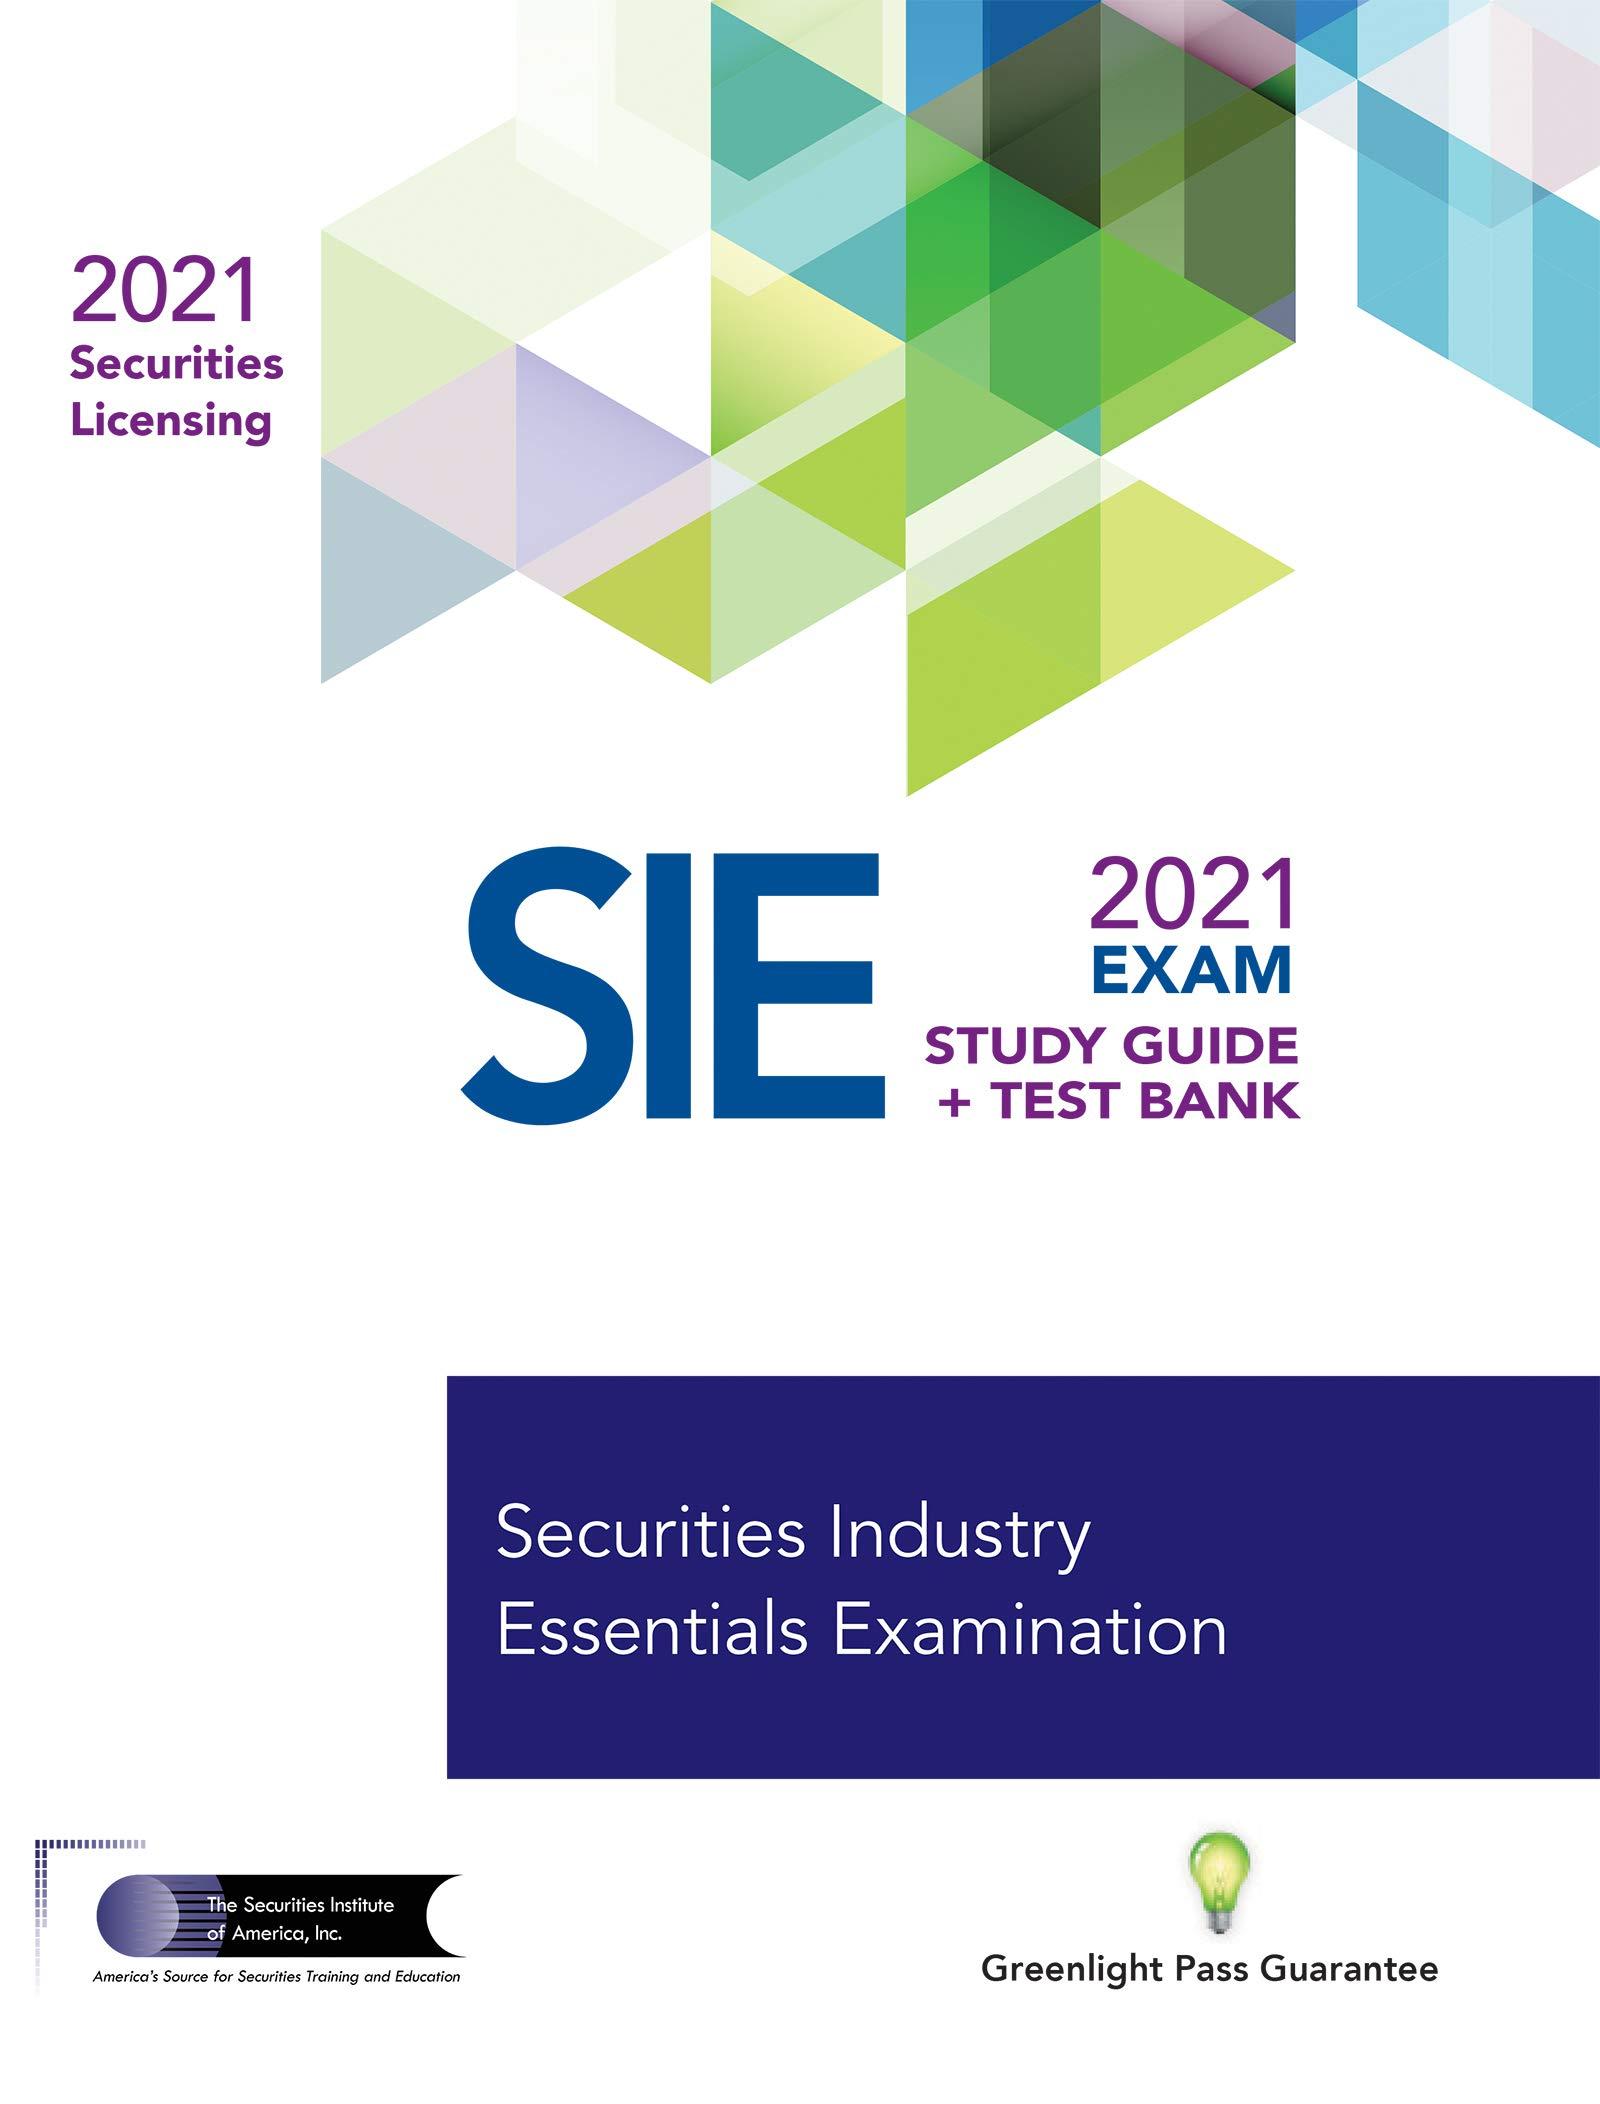 SECURITIES INDUSTRY ESSENTIALS EXAM STUDY GUIDE 2021 + TEST BANK